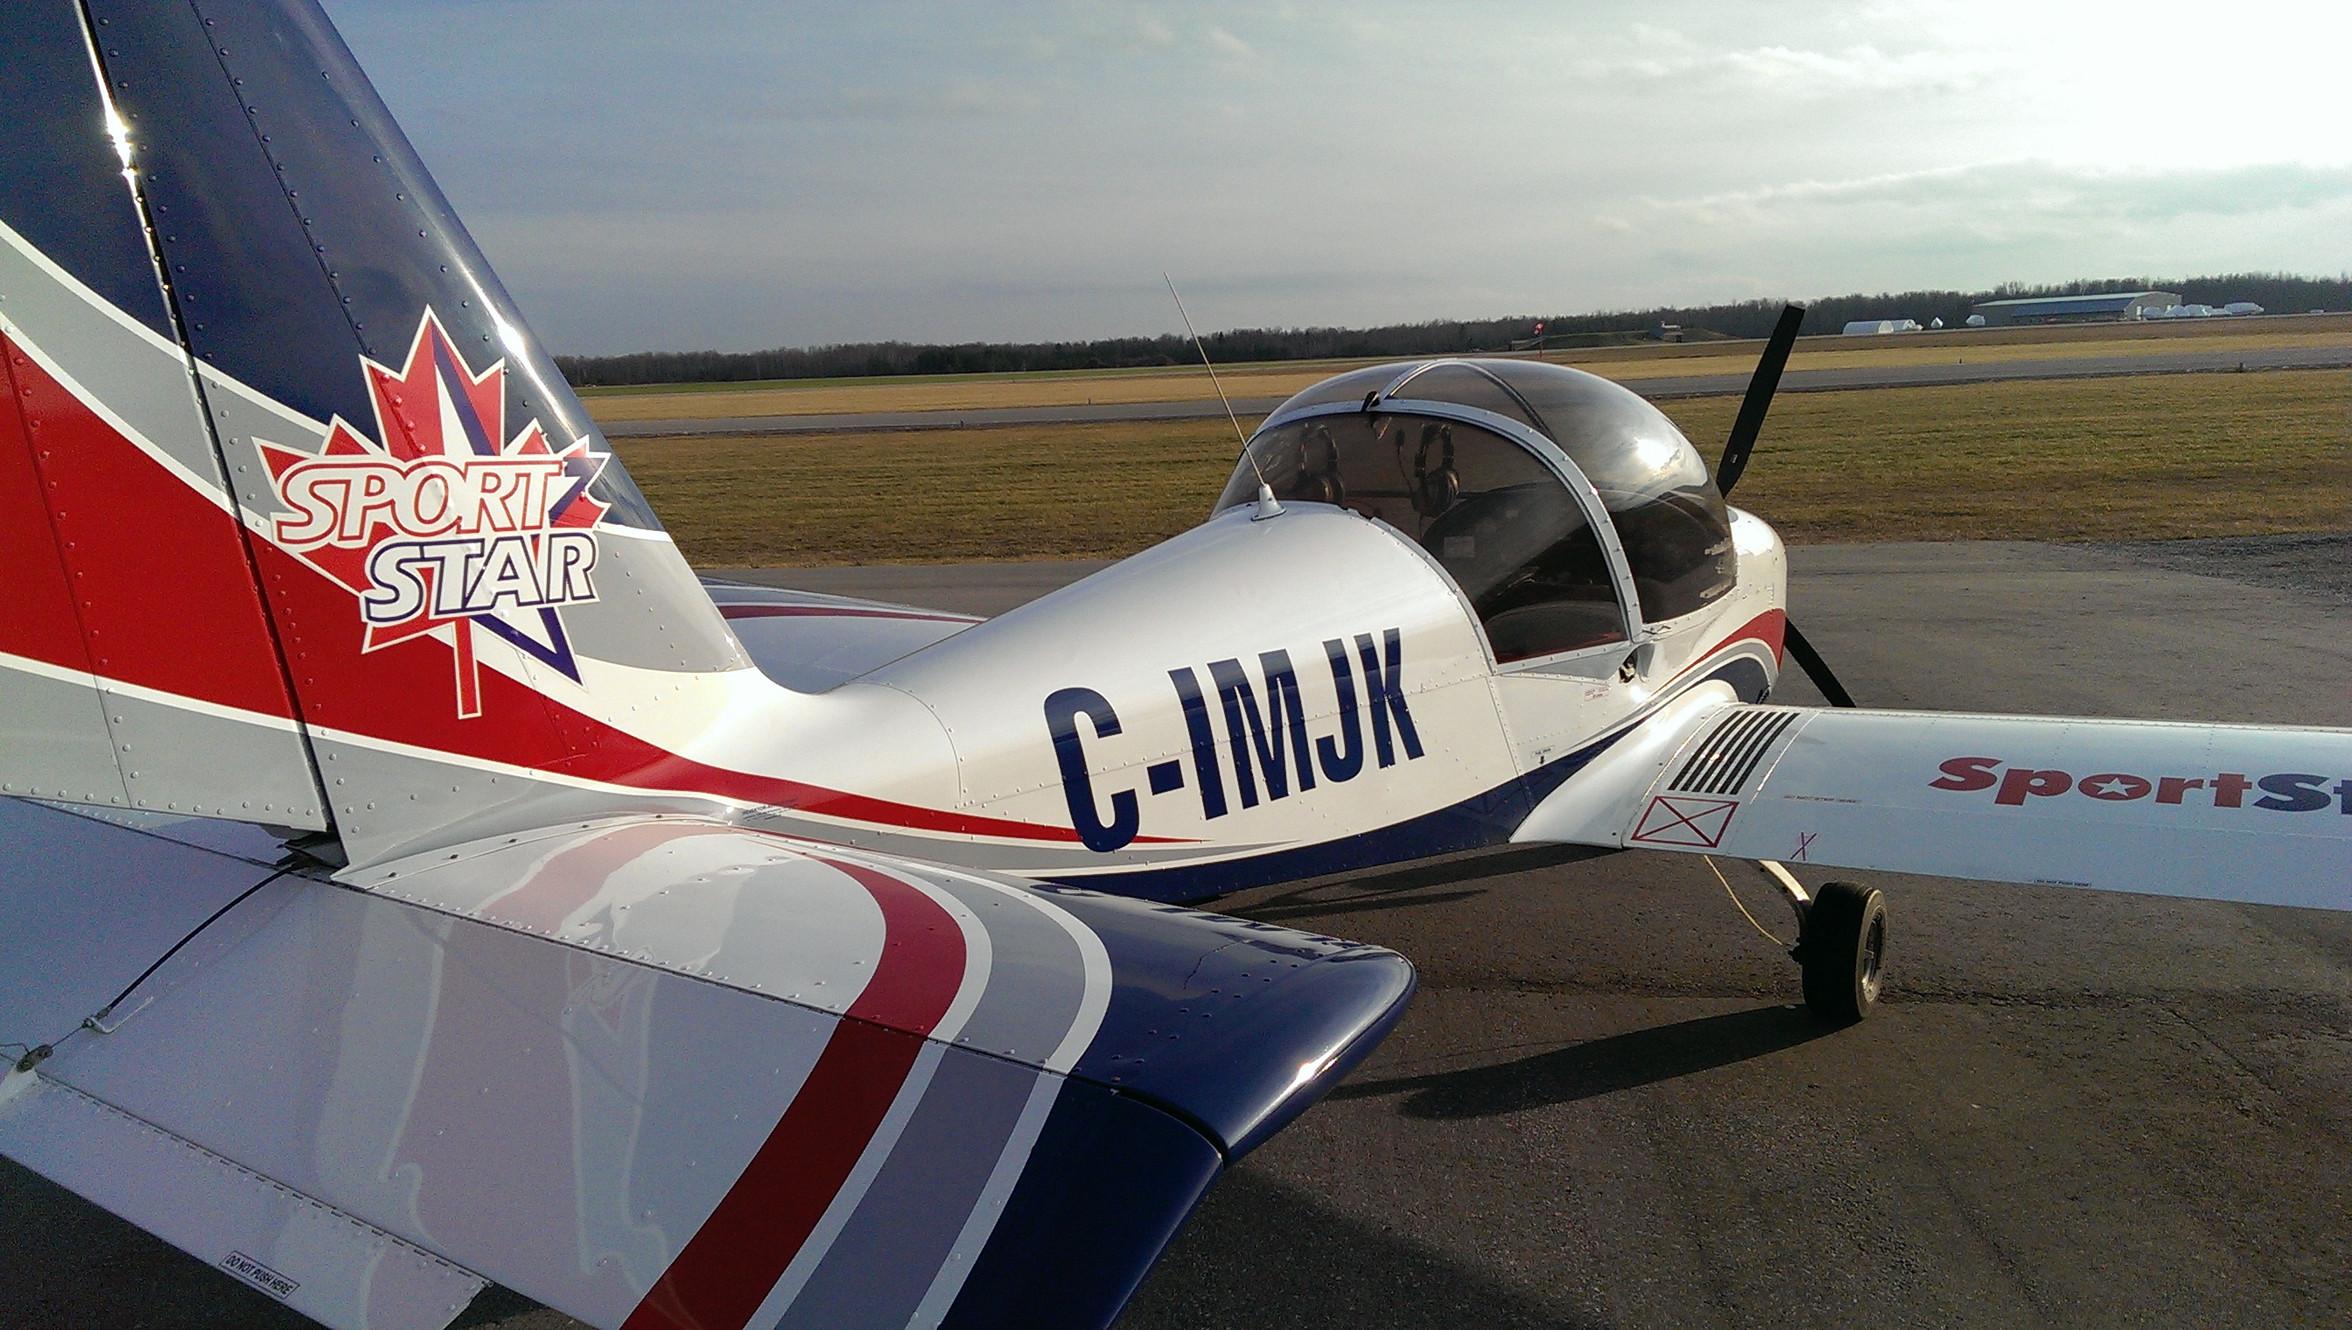 Skyview Ultralights - Advanced Ultralight Flight Training in